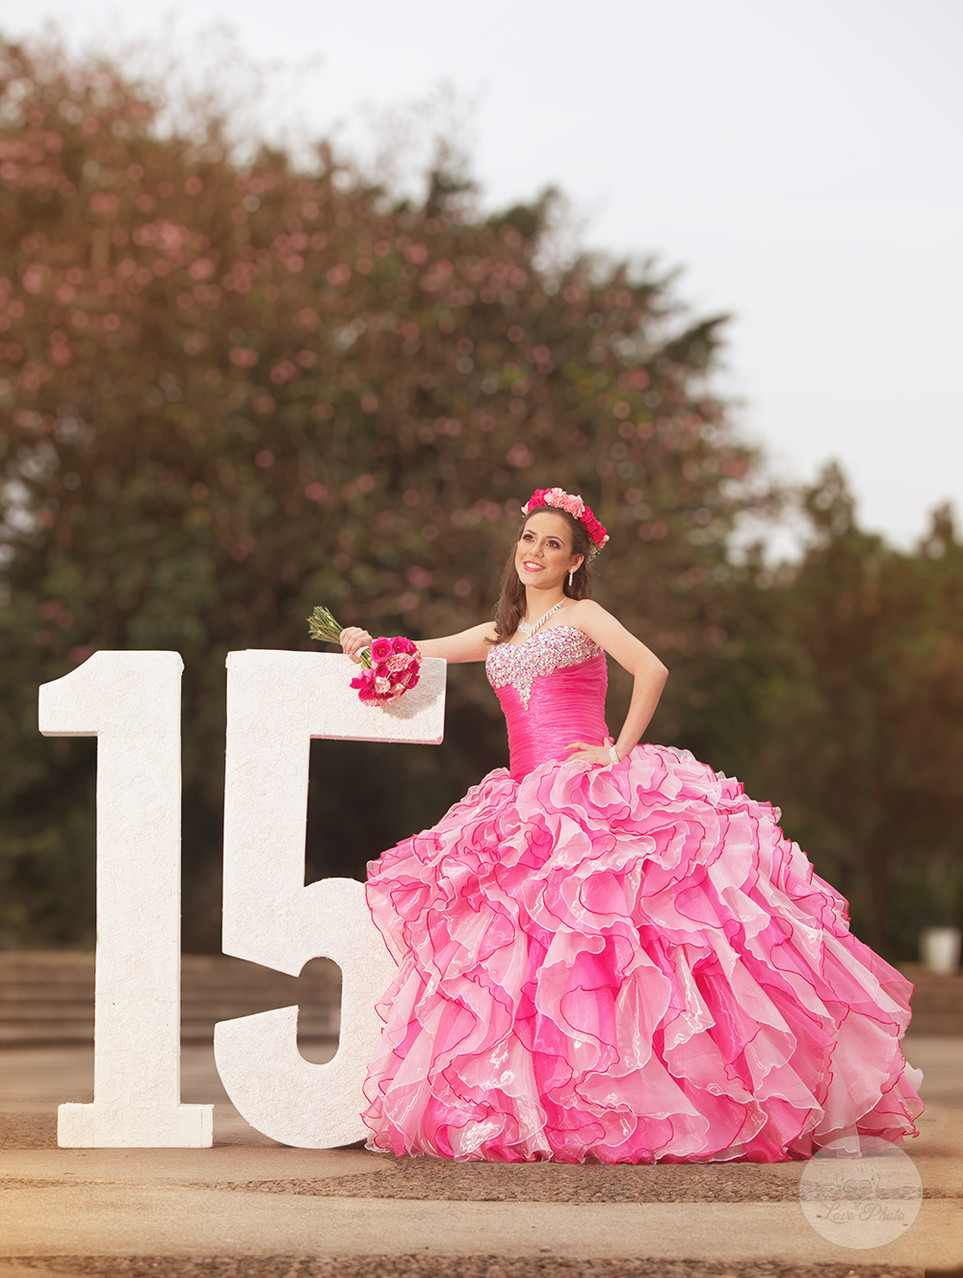 pink-dress-large-letters2(1).jpg